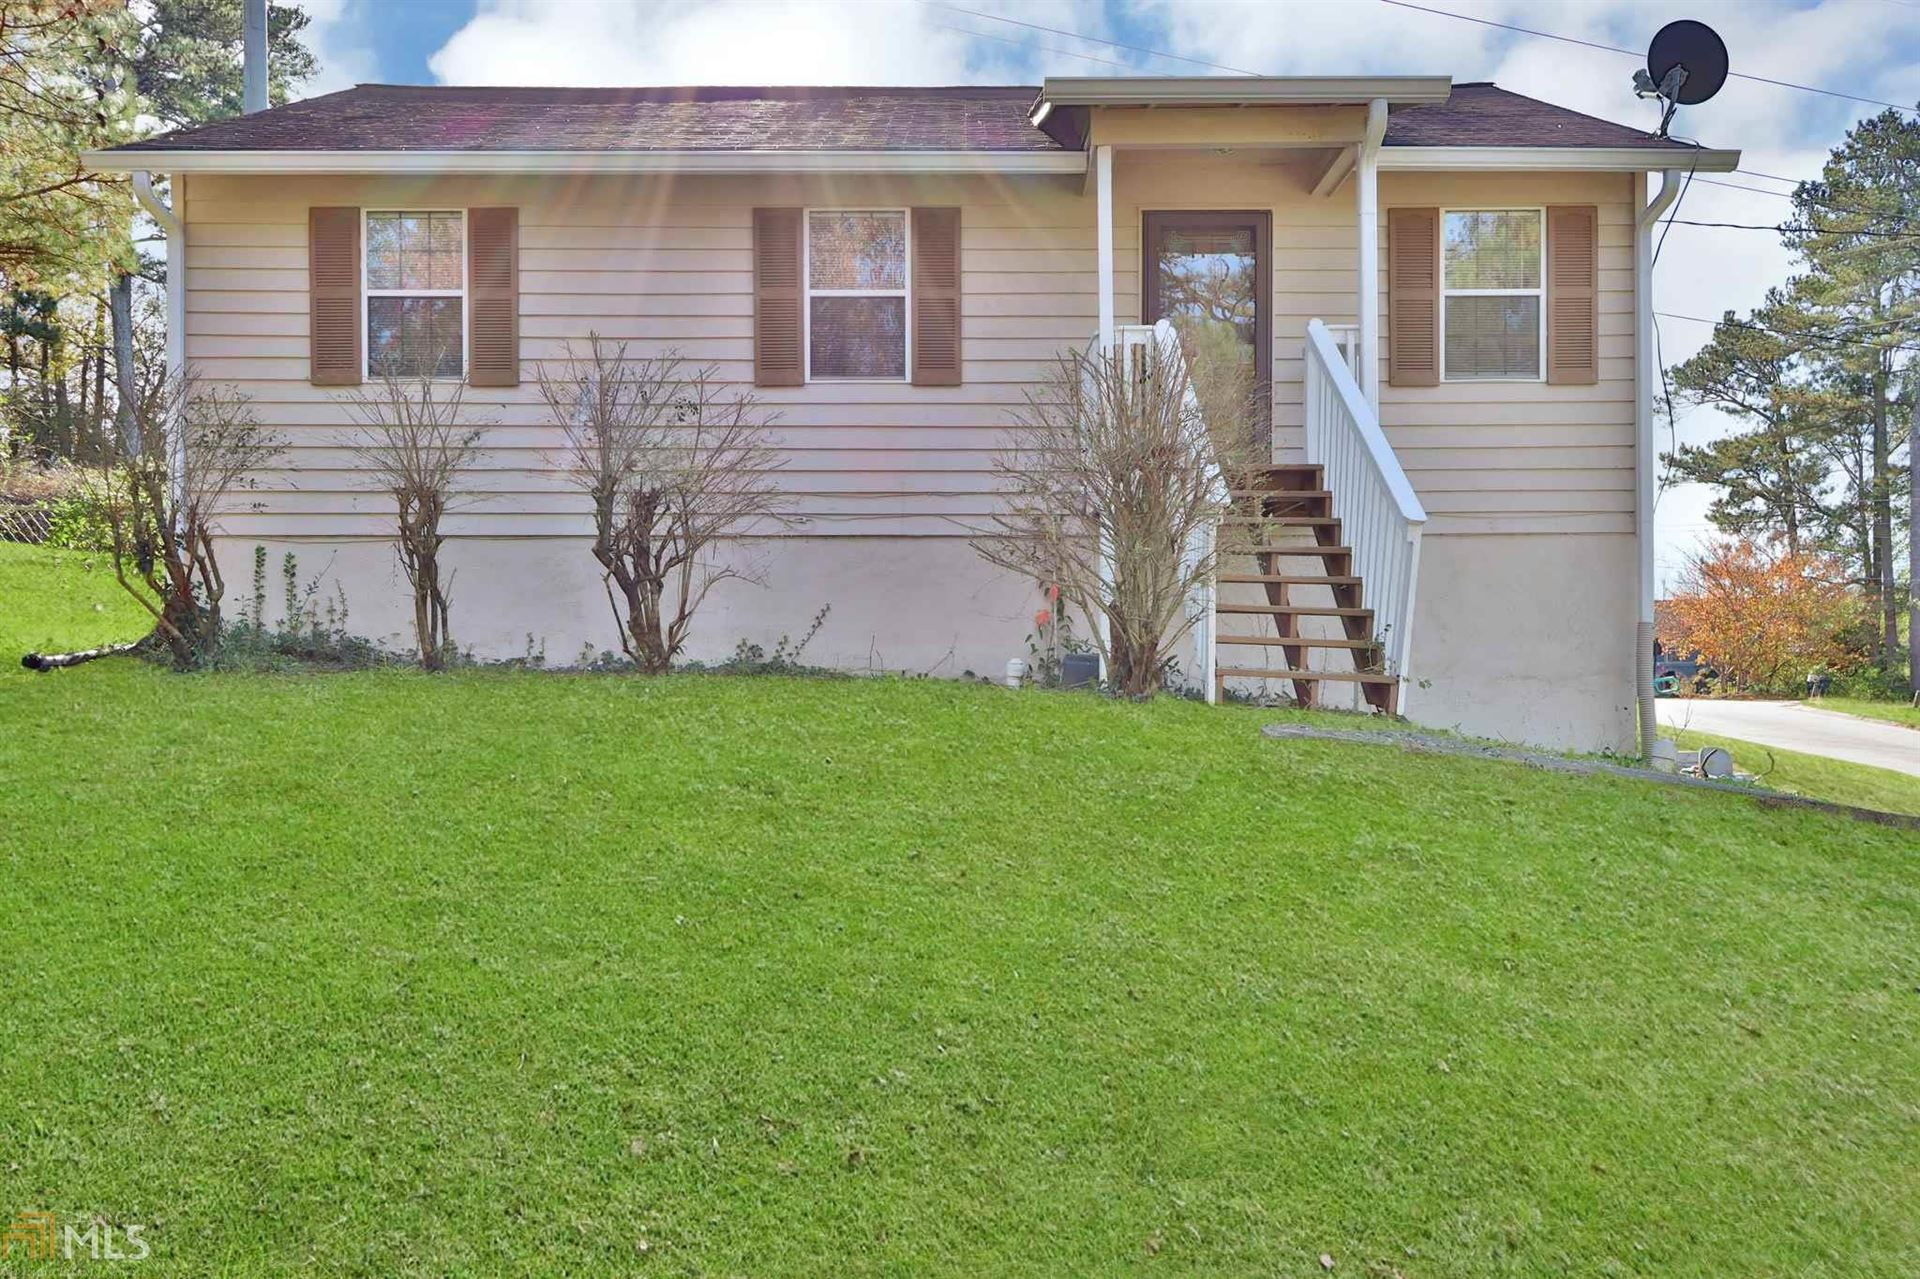 1181 Timbercrest, Lawrenceville, GA 30045 - MLS#: 8894340